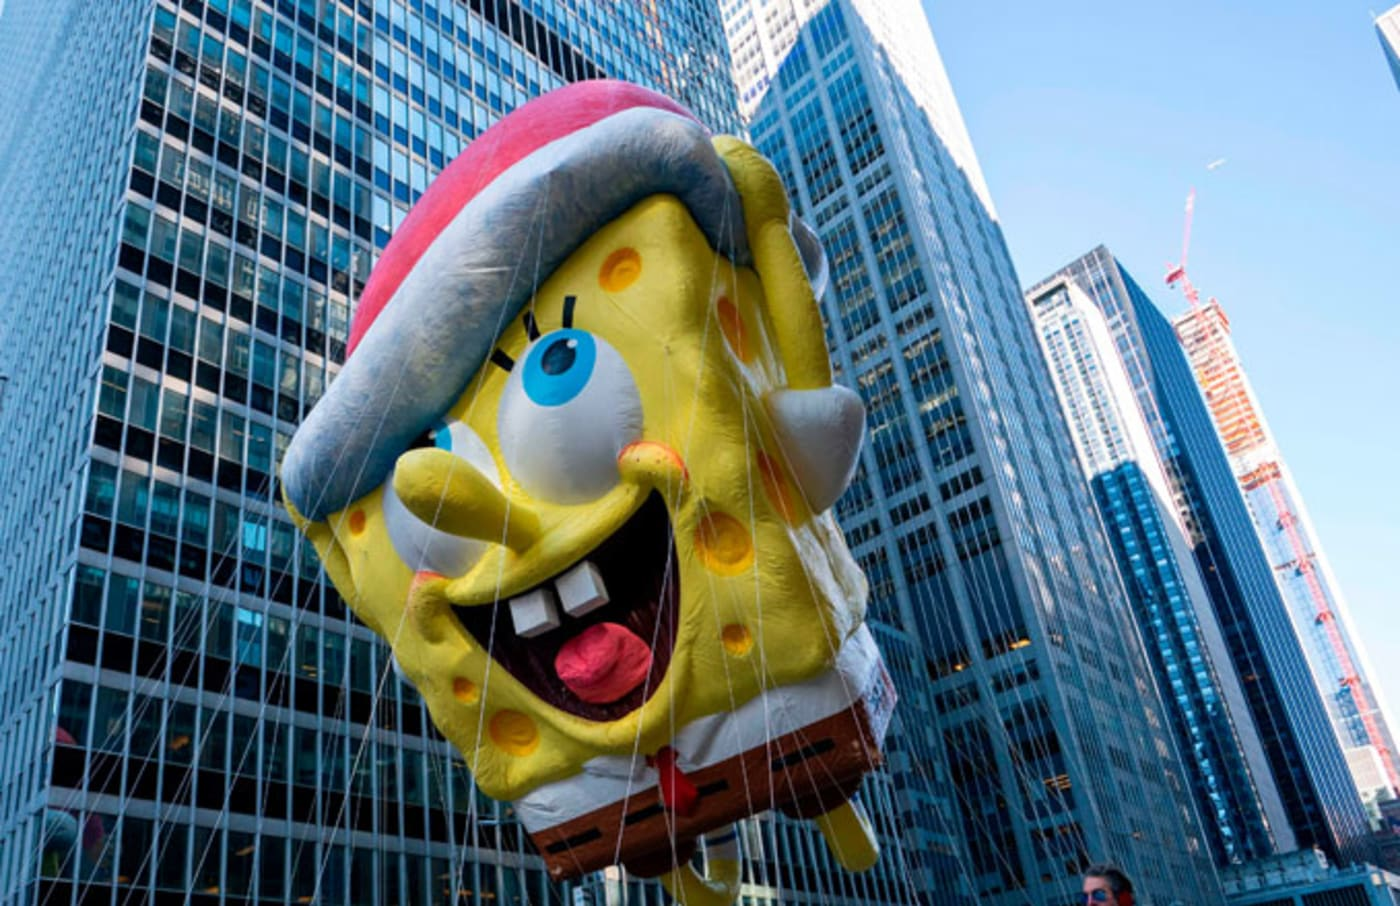 Spongebob Thanksgiving Float